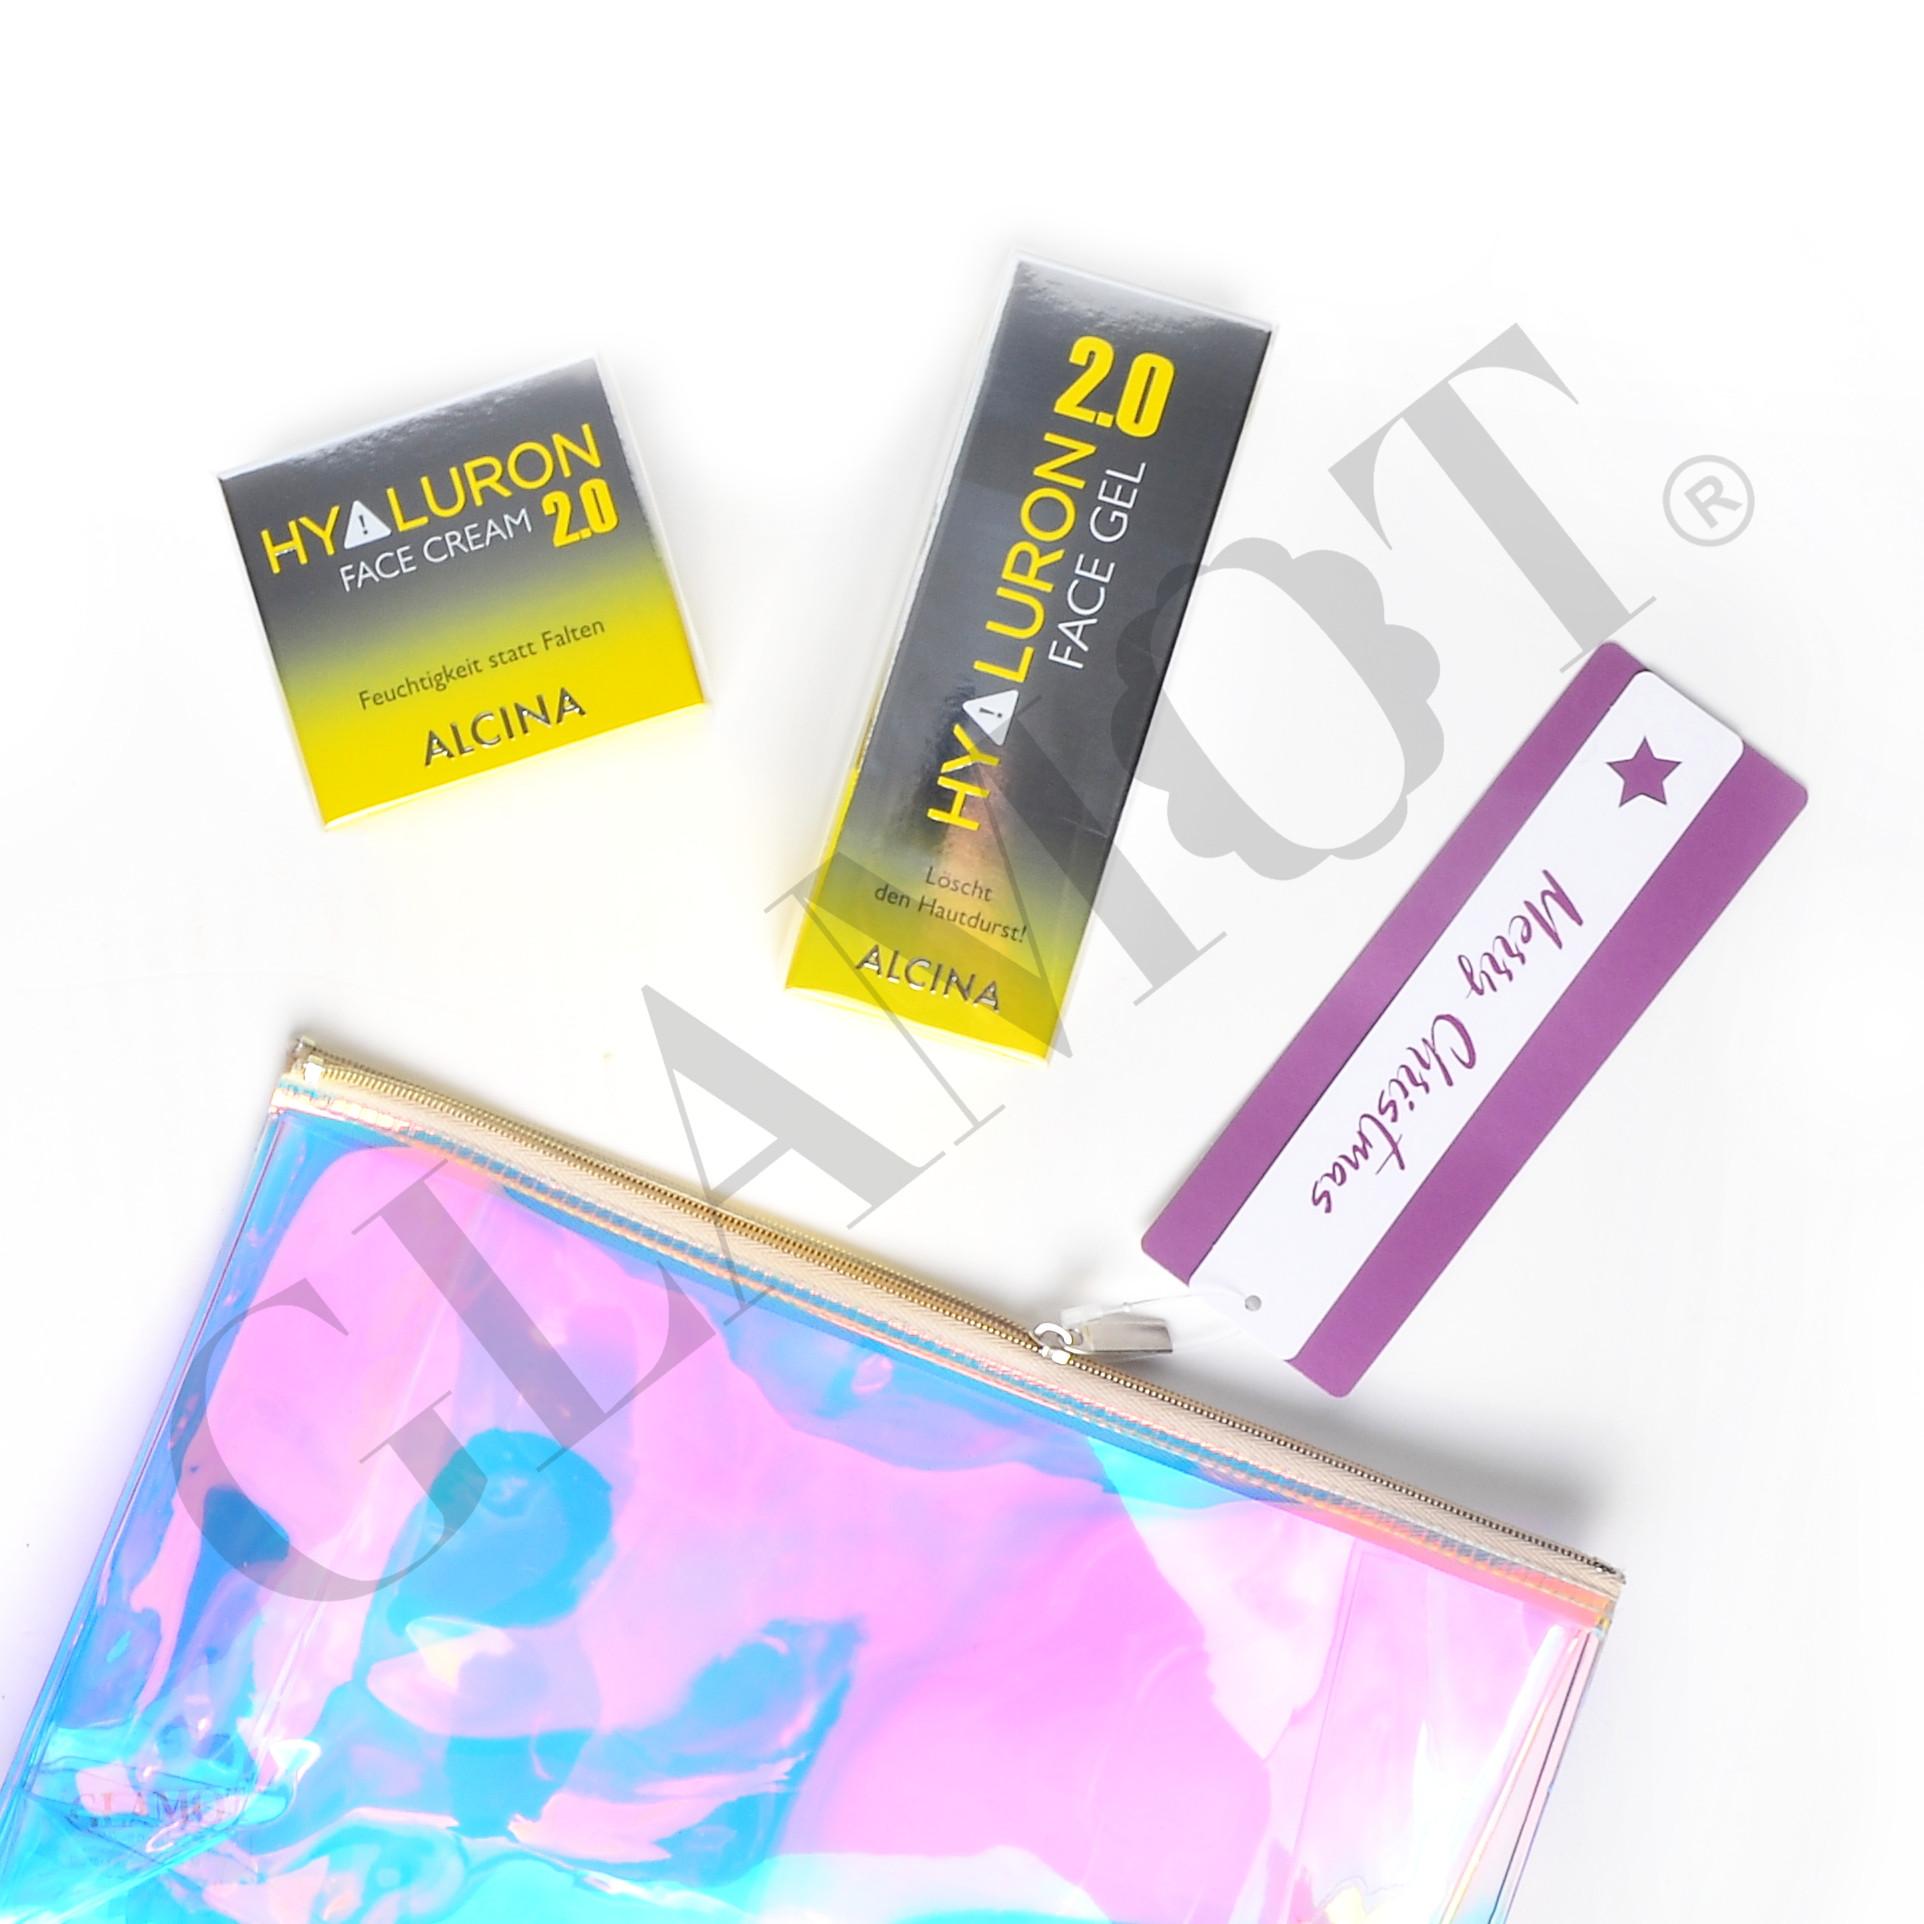 Alcina Hyaluron 20 Skincare Gift Set Glamotcom